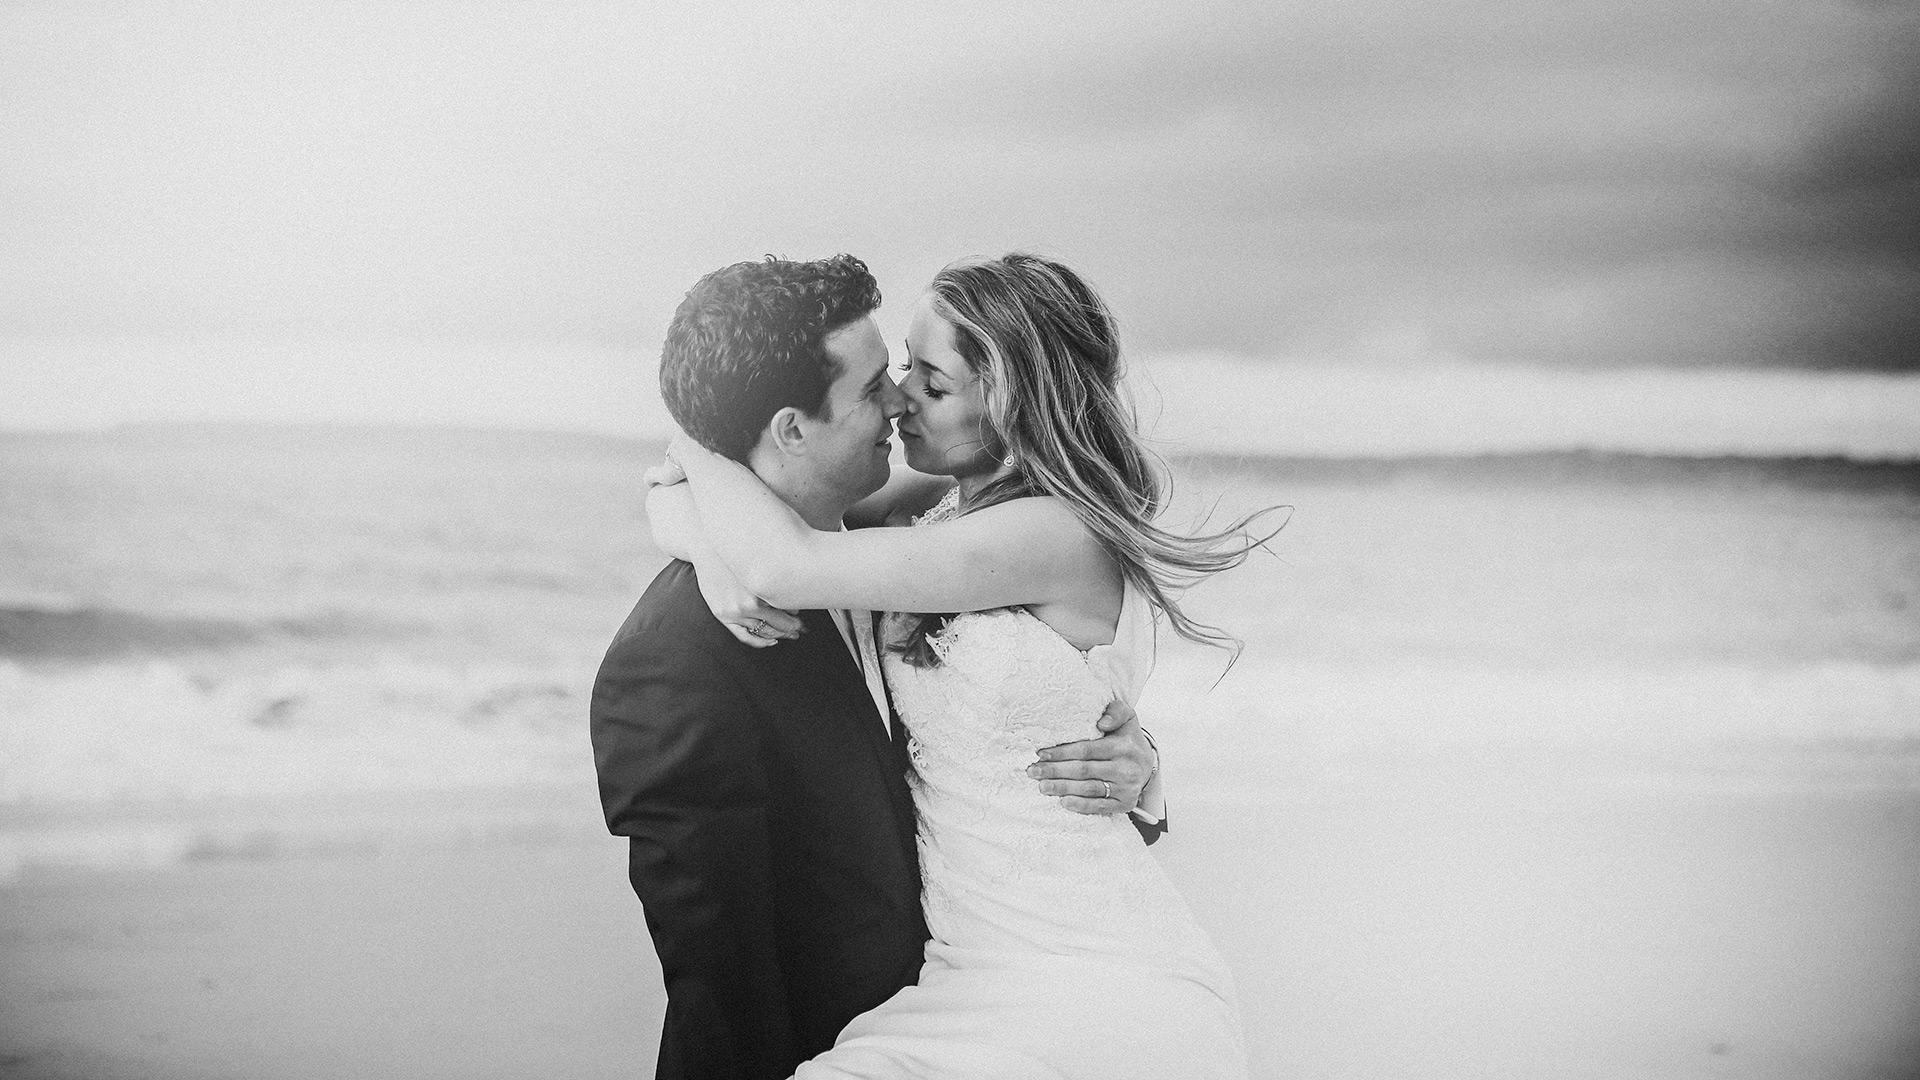 Carbis Bay Wedding Photographer - Photography Style